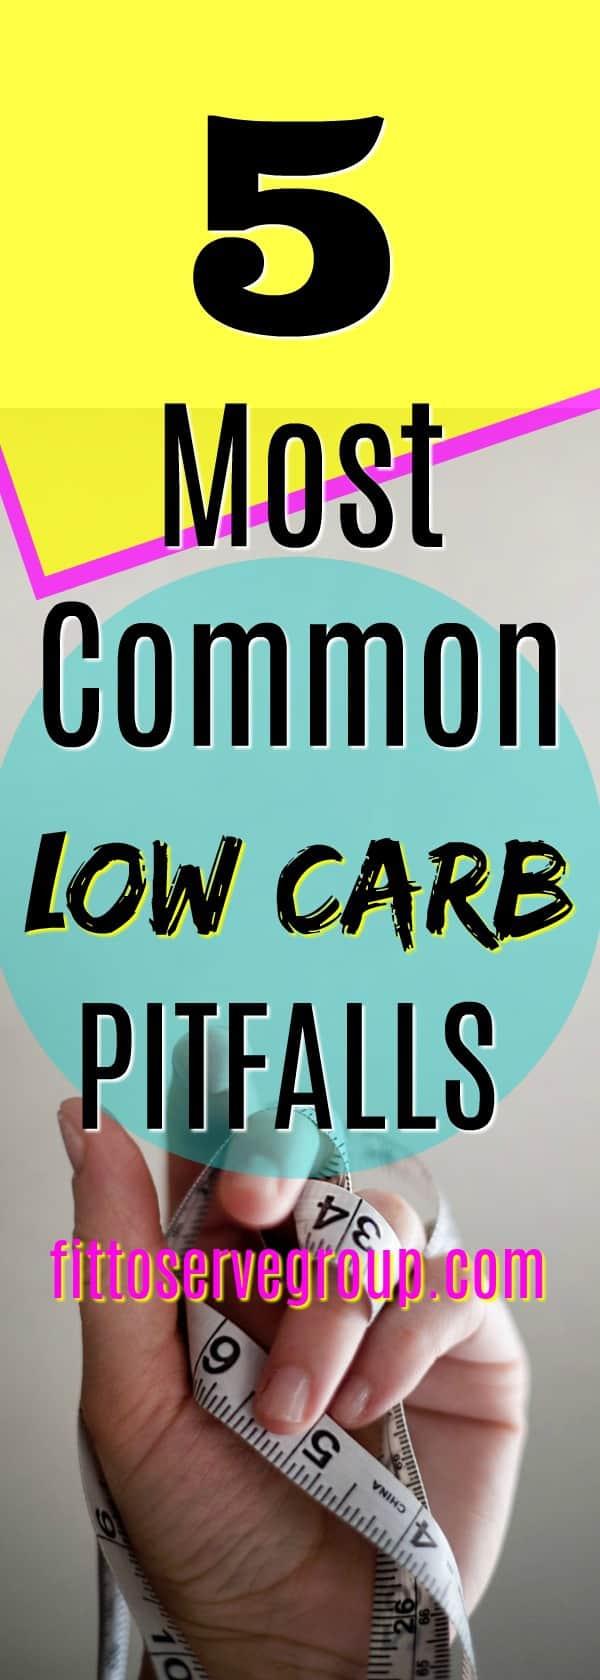 5 most common keto pitfalls